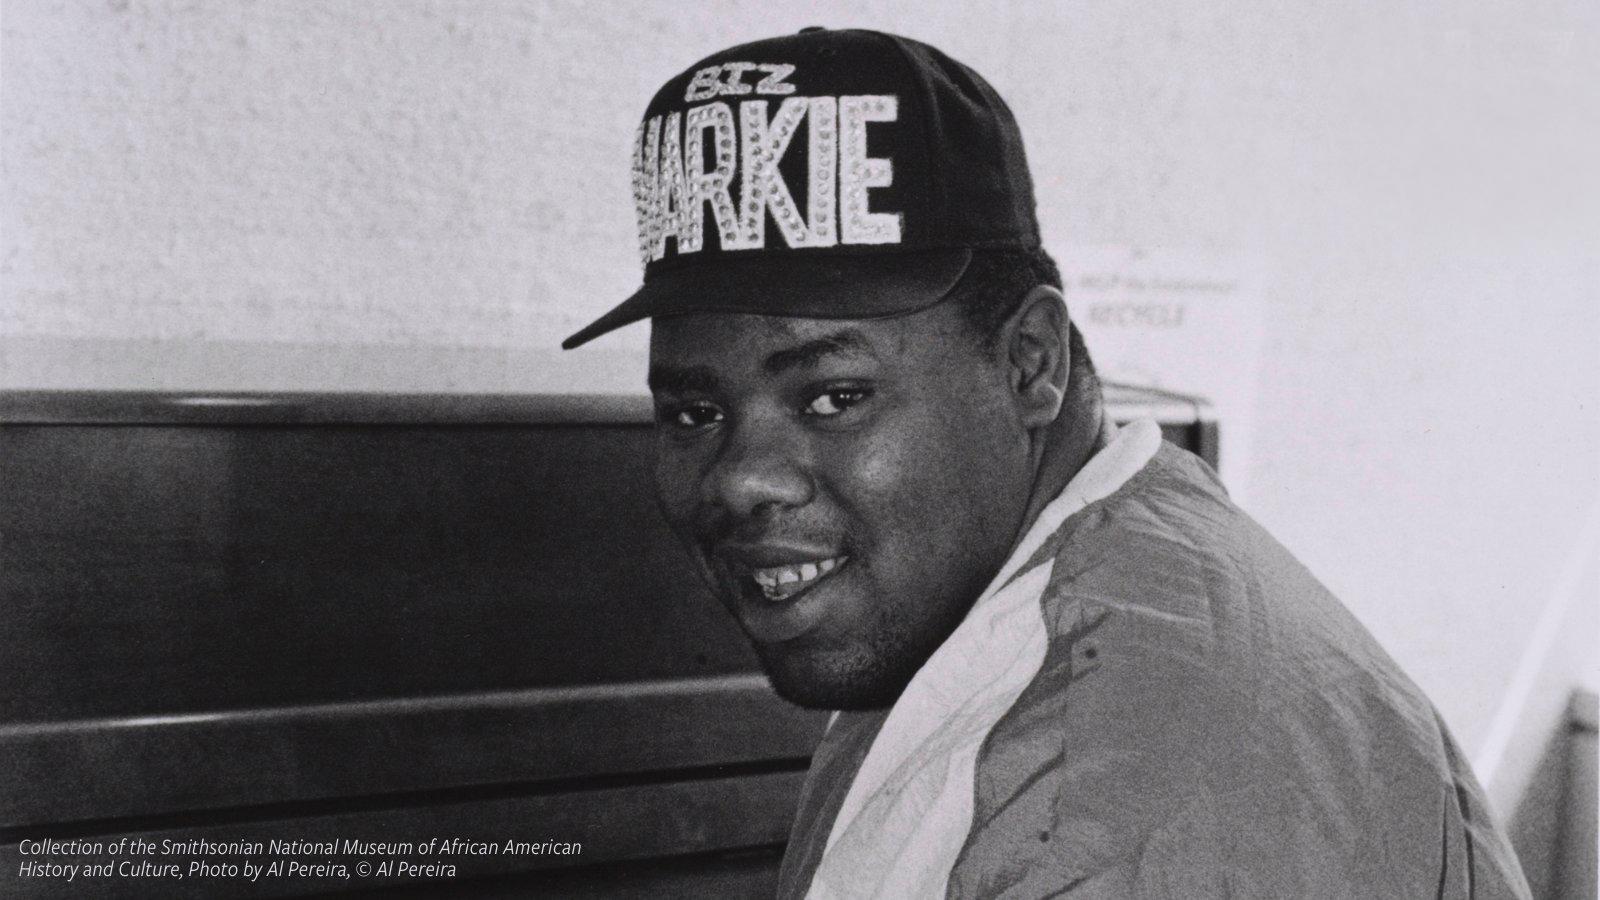 Vinyl Saved My Life: A Tribute to Biz Markie